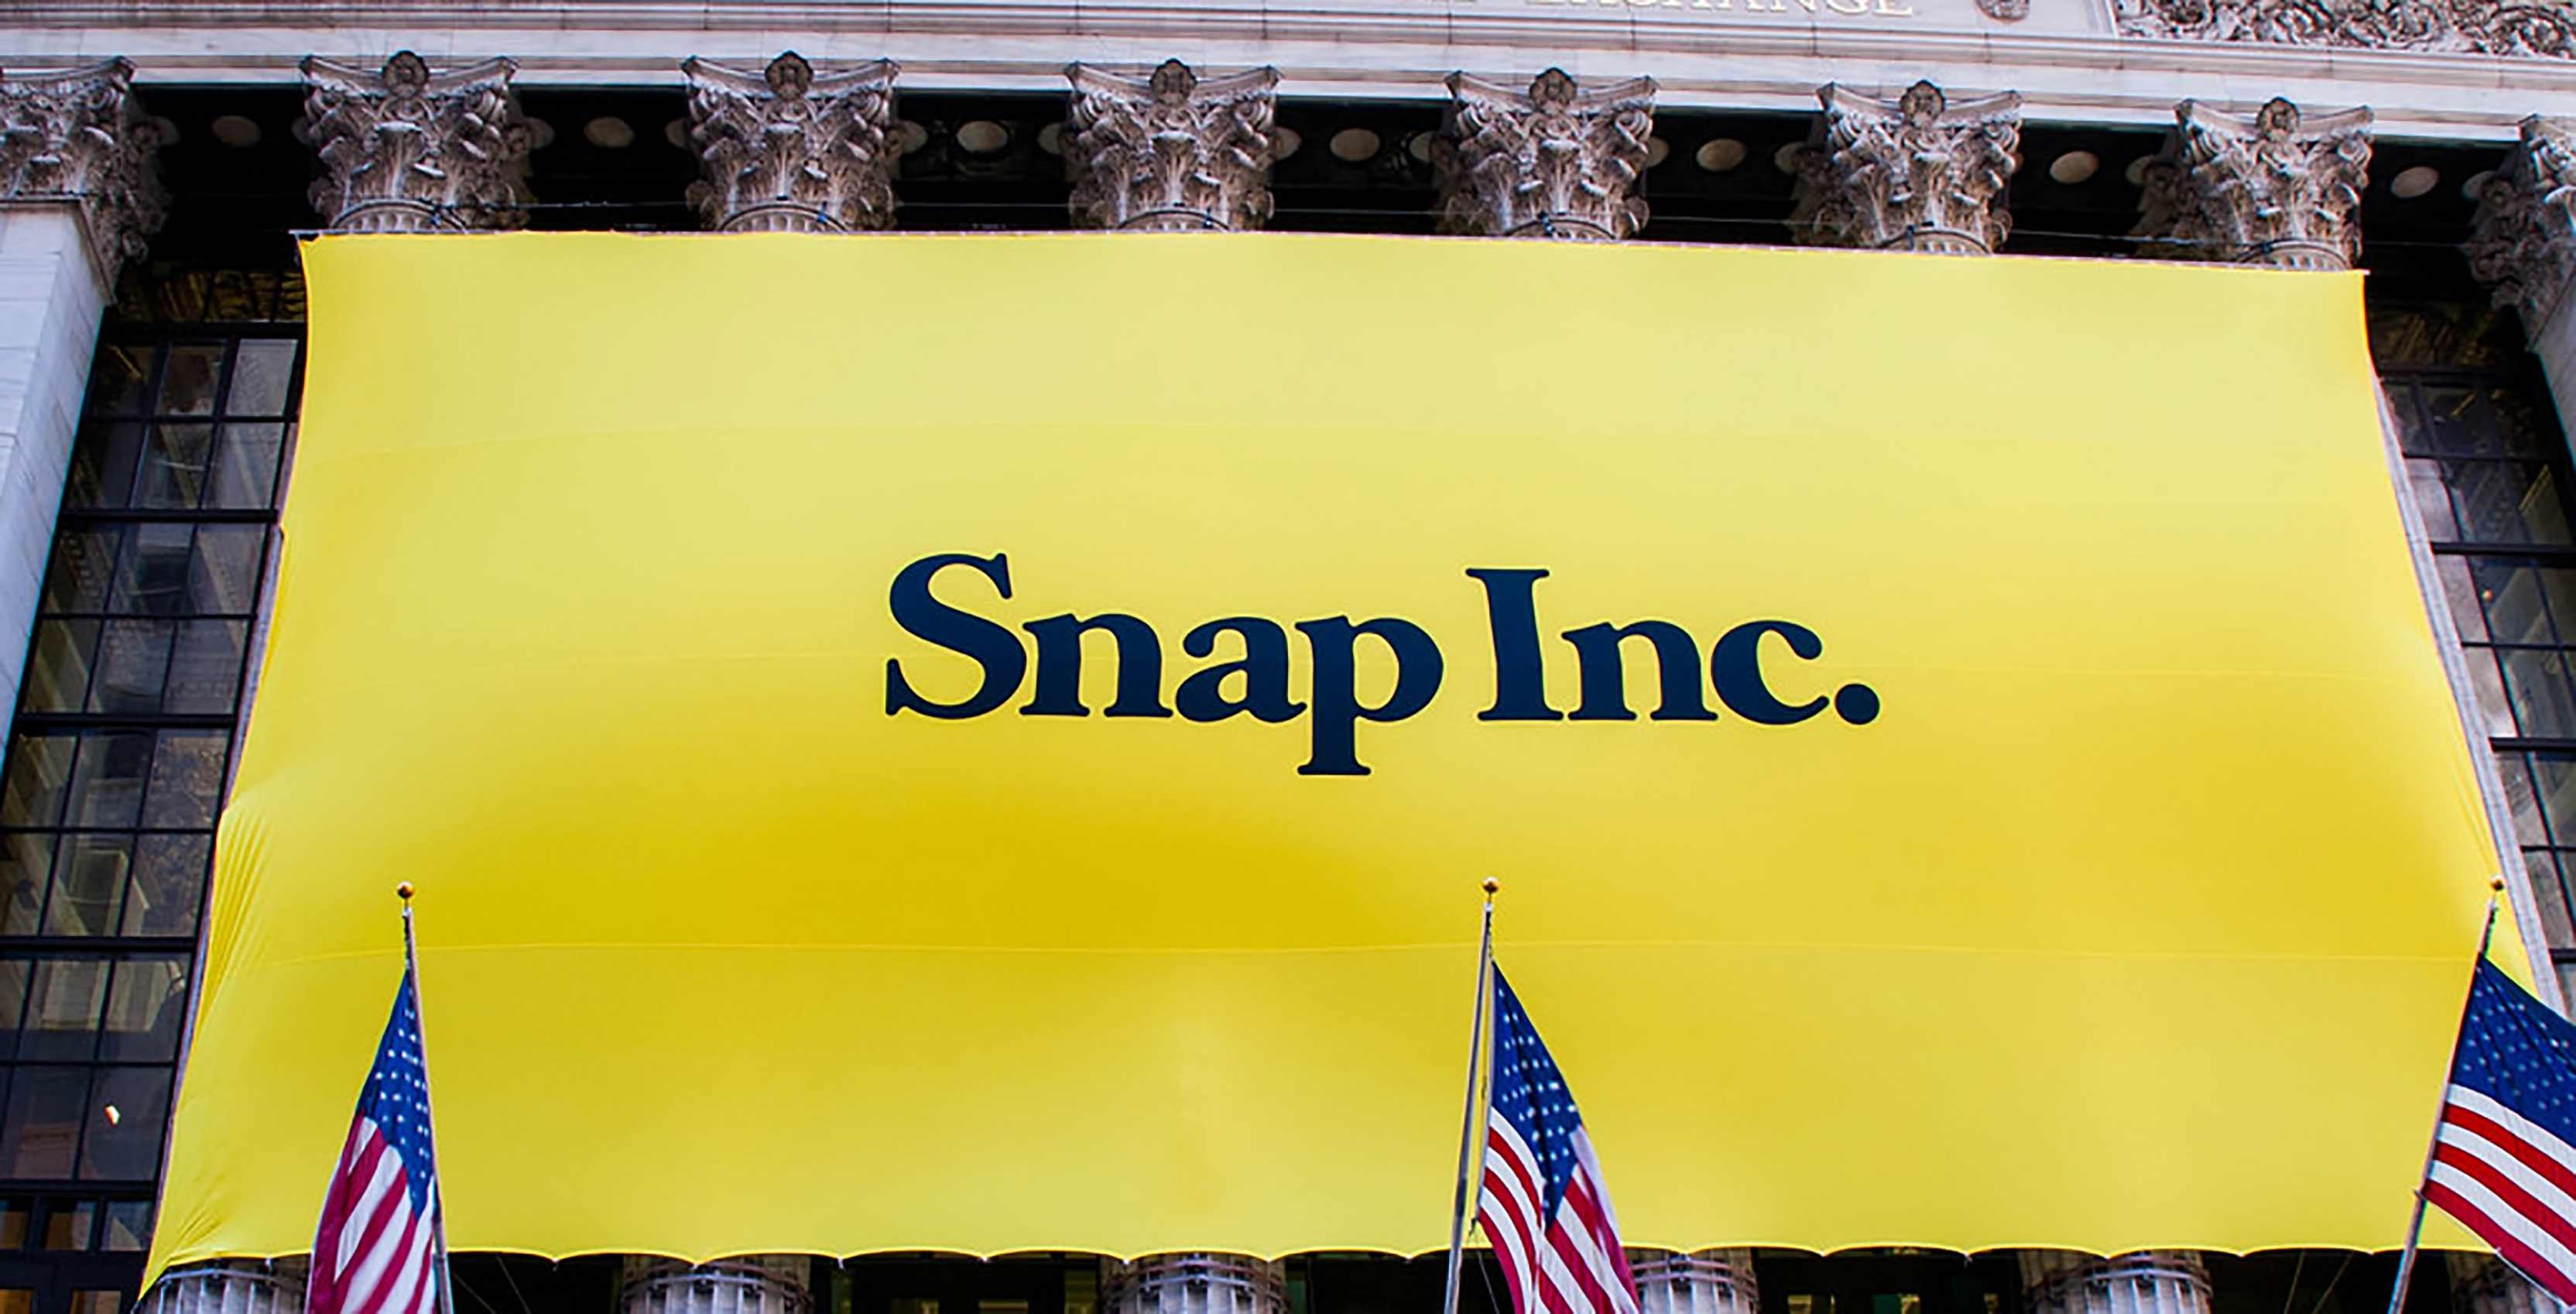 Snap Inc. banner